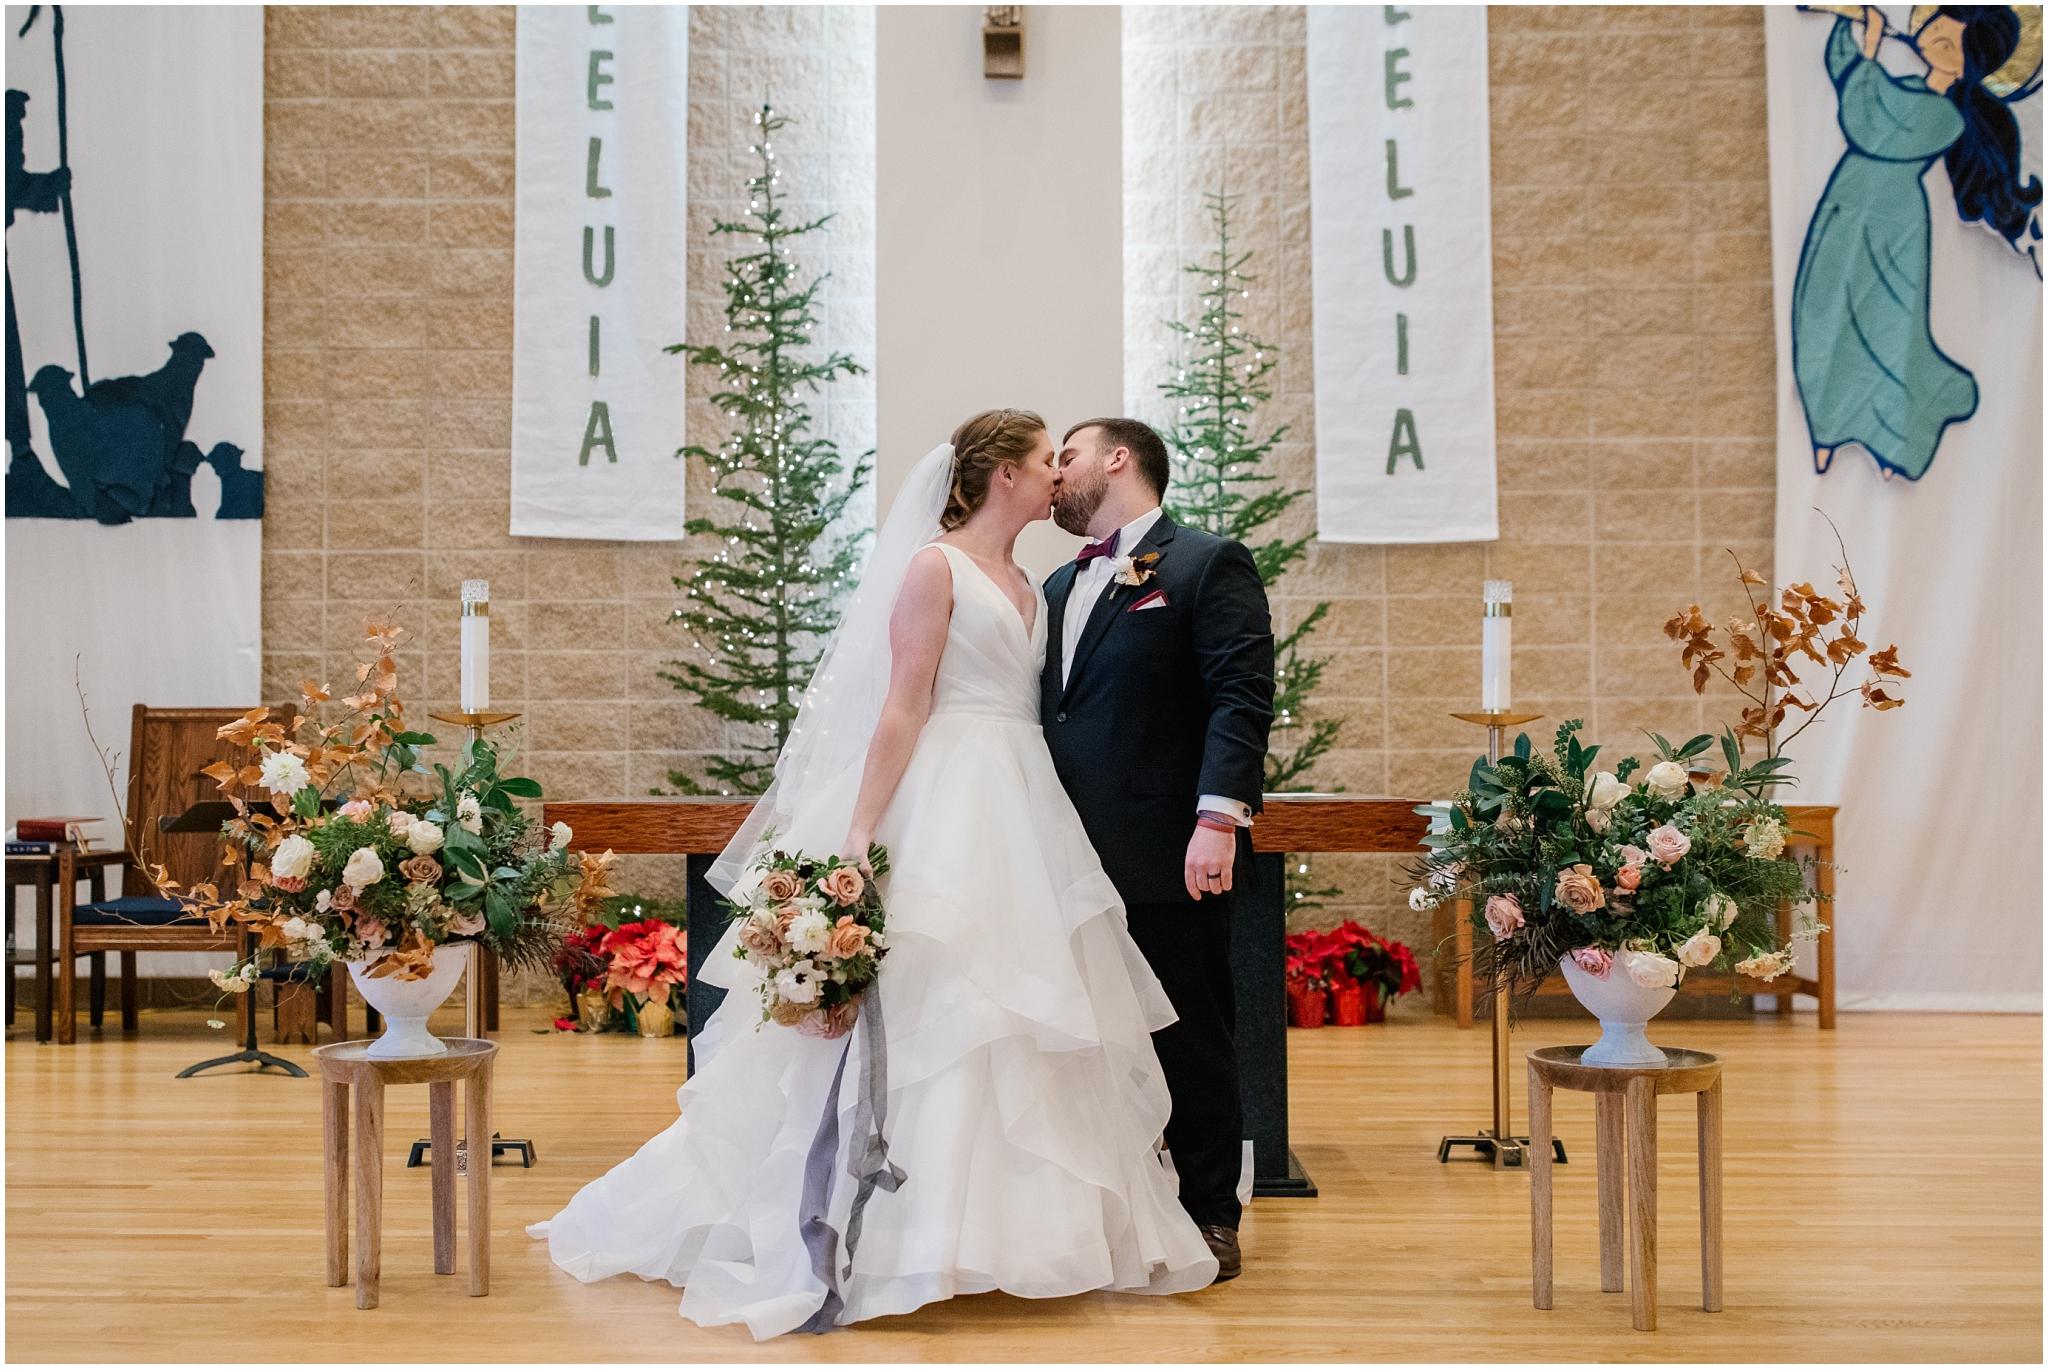 CN-Wedding-218_Lizzie-B-Imagery-Utah-Wedding-Photographer-Blessed-Sacrament-Catholic-Church-Sandy-Utah-The-Blended-Table-Salt-Lake-City.jpg